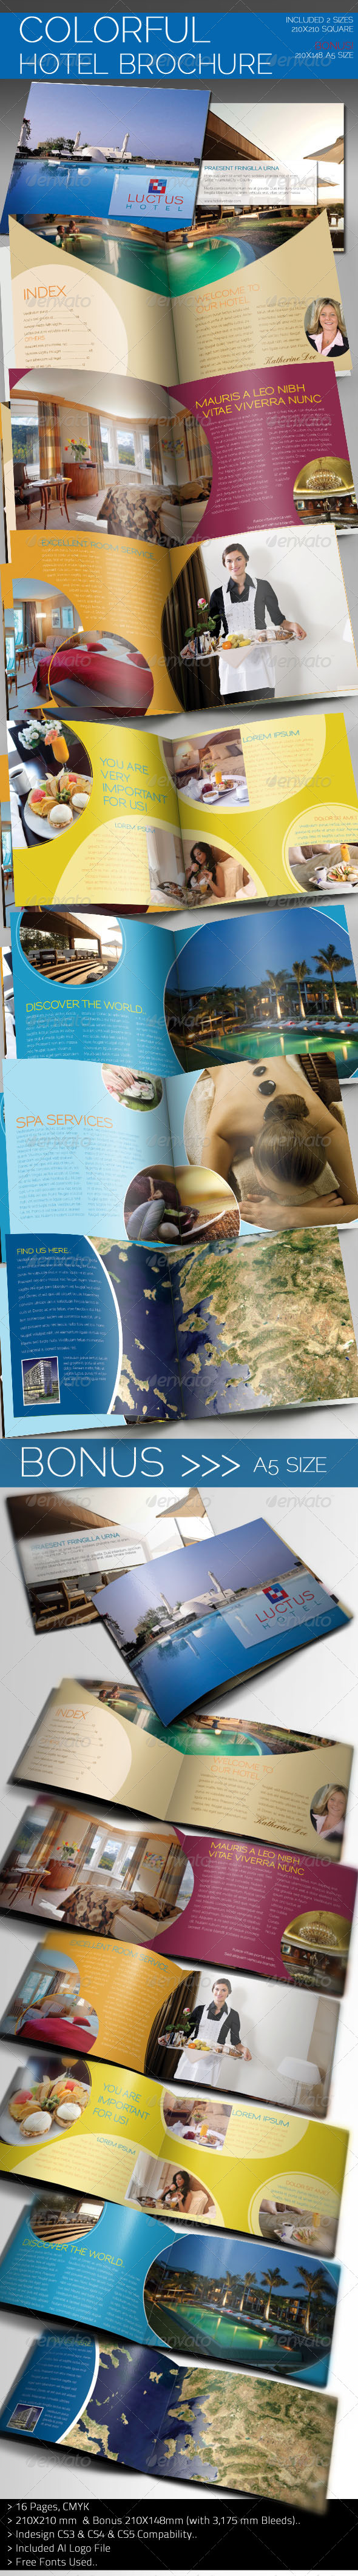 GraphicRiver Colorful Hotel Brochure 1577120